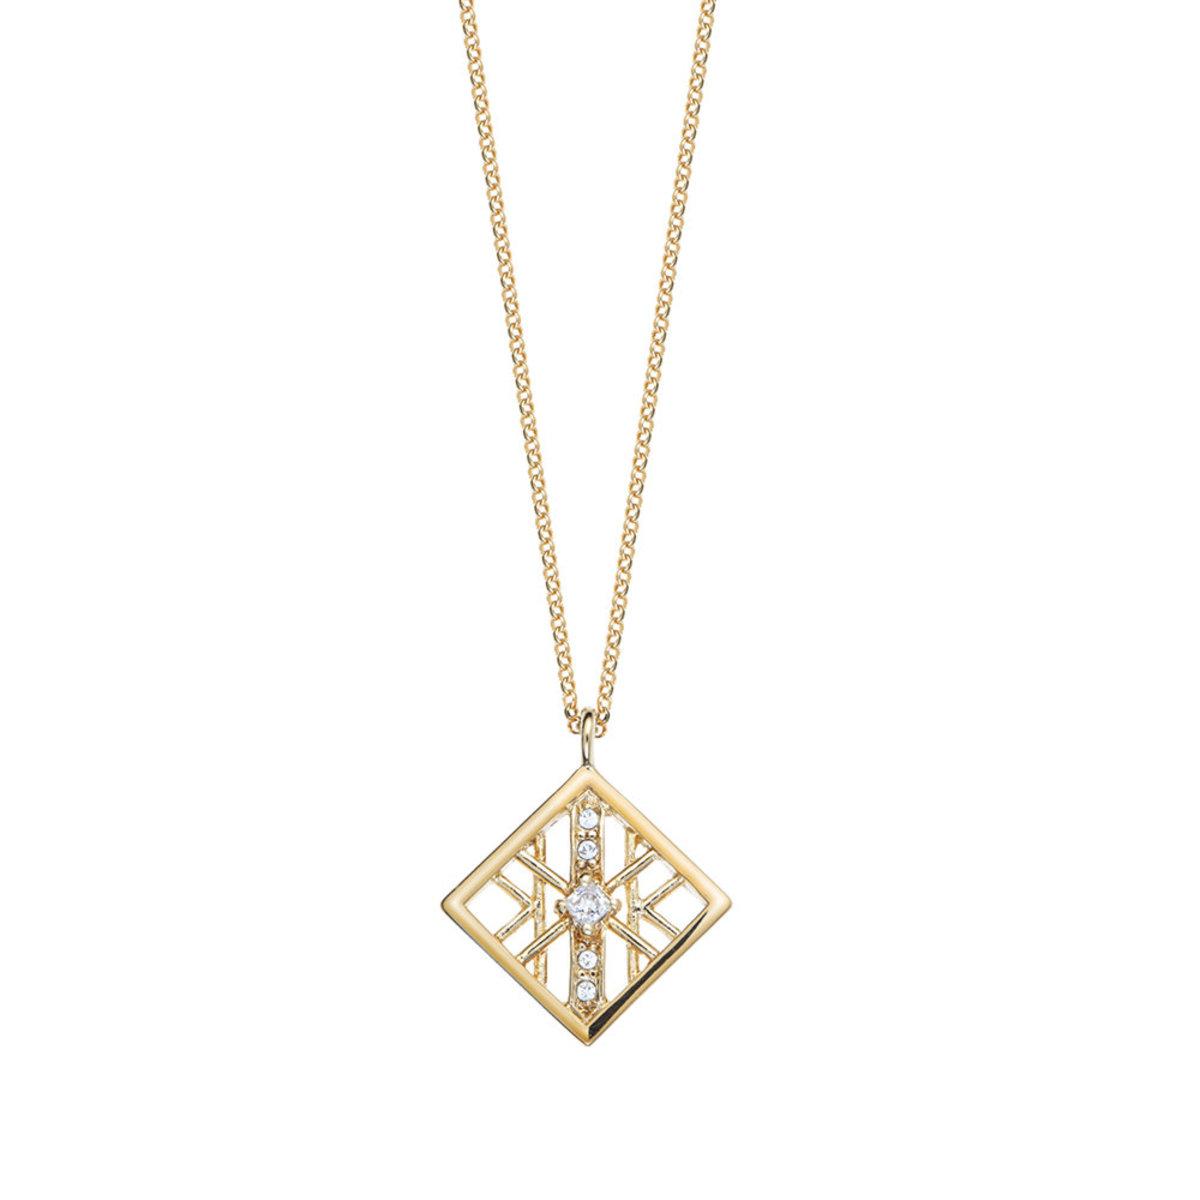 Alluring: gold plating, Swarovski crystal, square pendant necklace